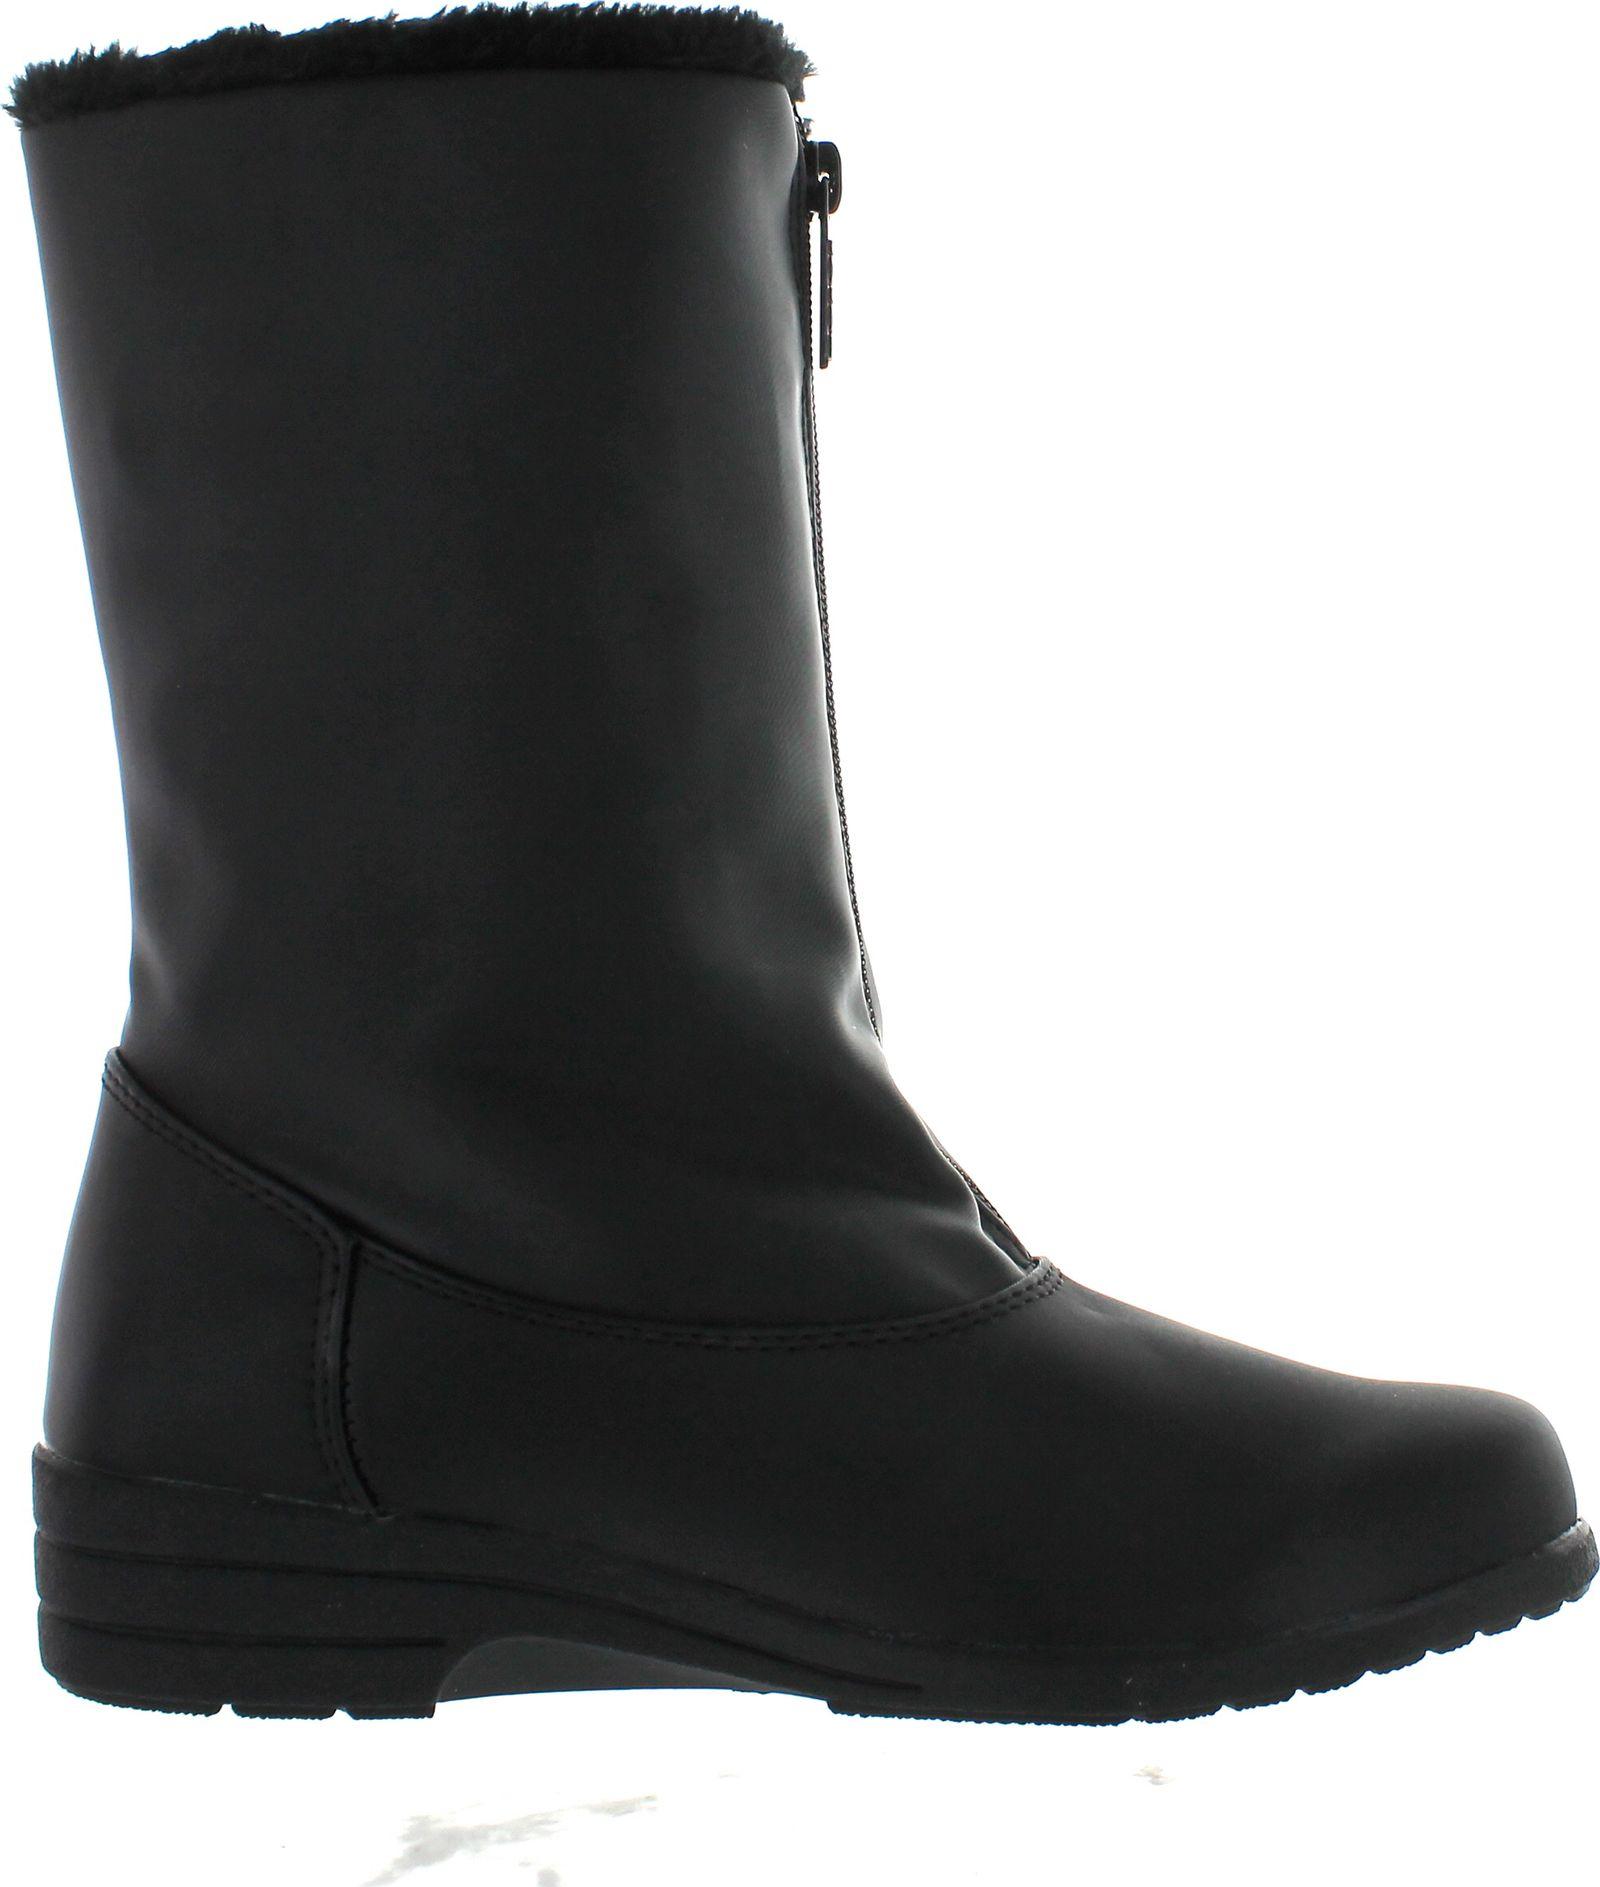 Beautiful  Snowvalley Waterproof Insulated Winter Snow Boot Shoe  Womens  EBay